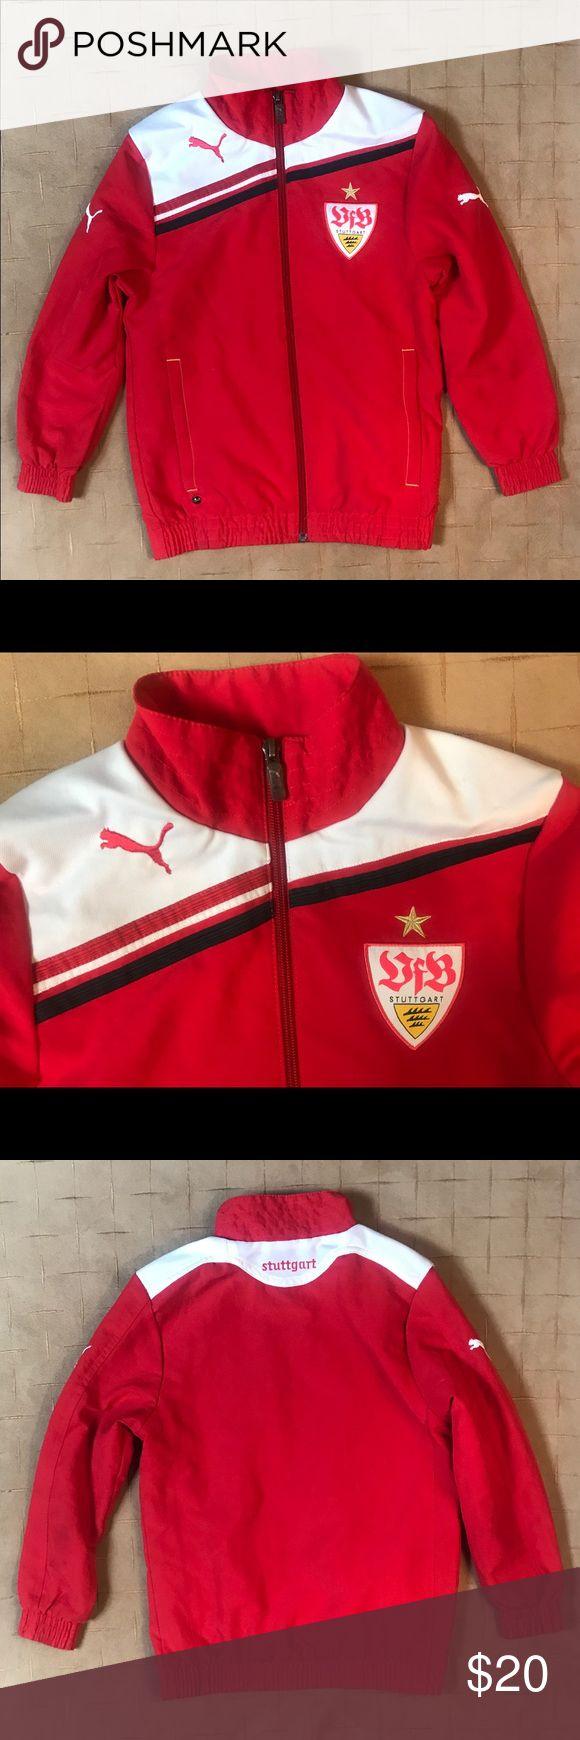 ♻️puma Stuttgart Football jacket size YSmall ♻️Puma German Stuttgart Football Full Zip Jacket Puma Jackets & Coats